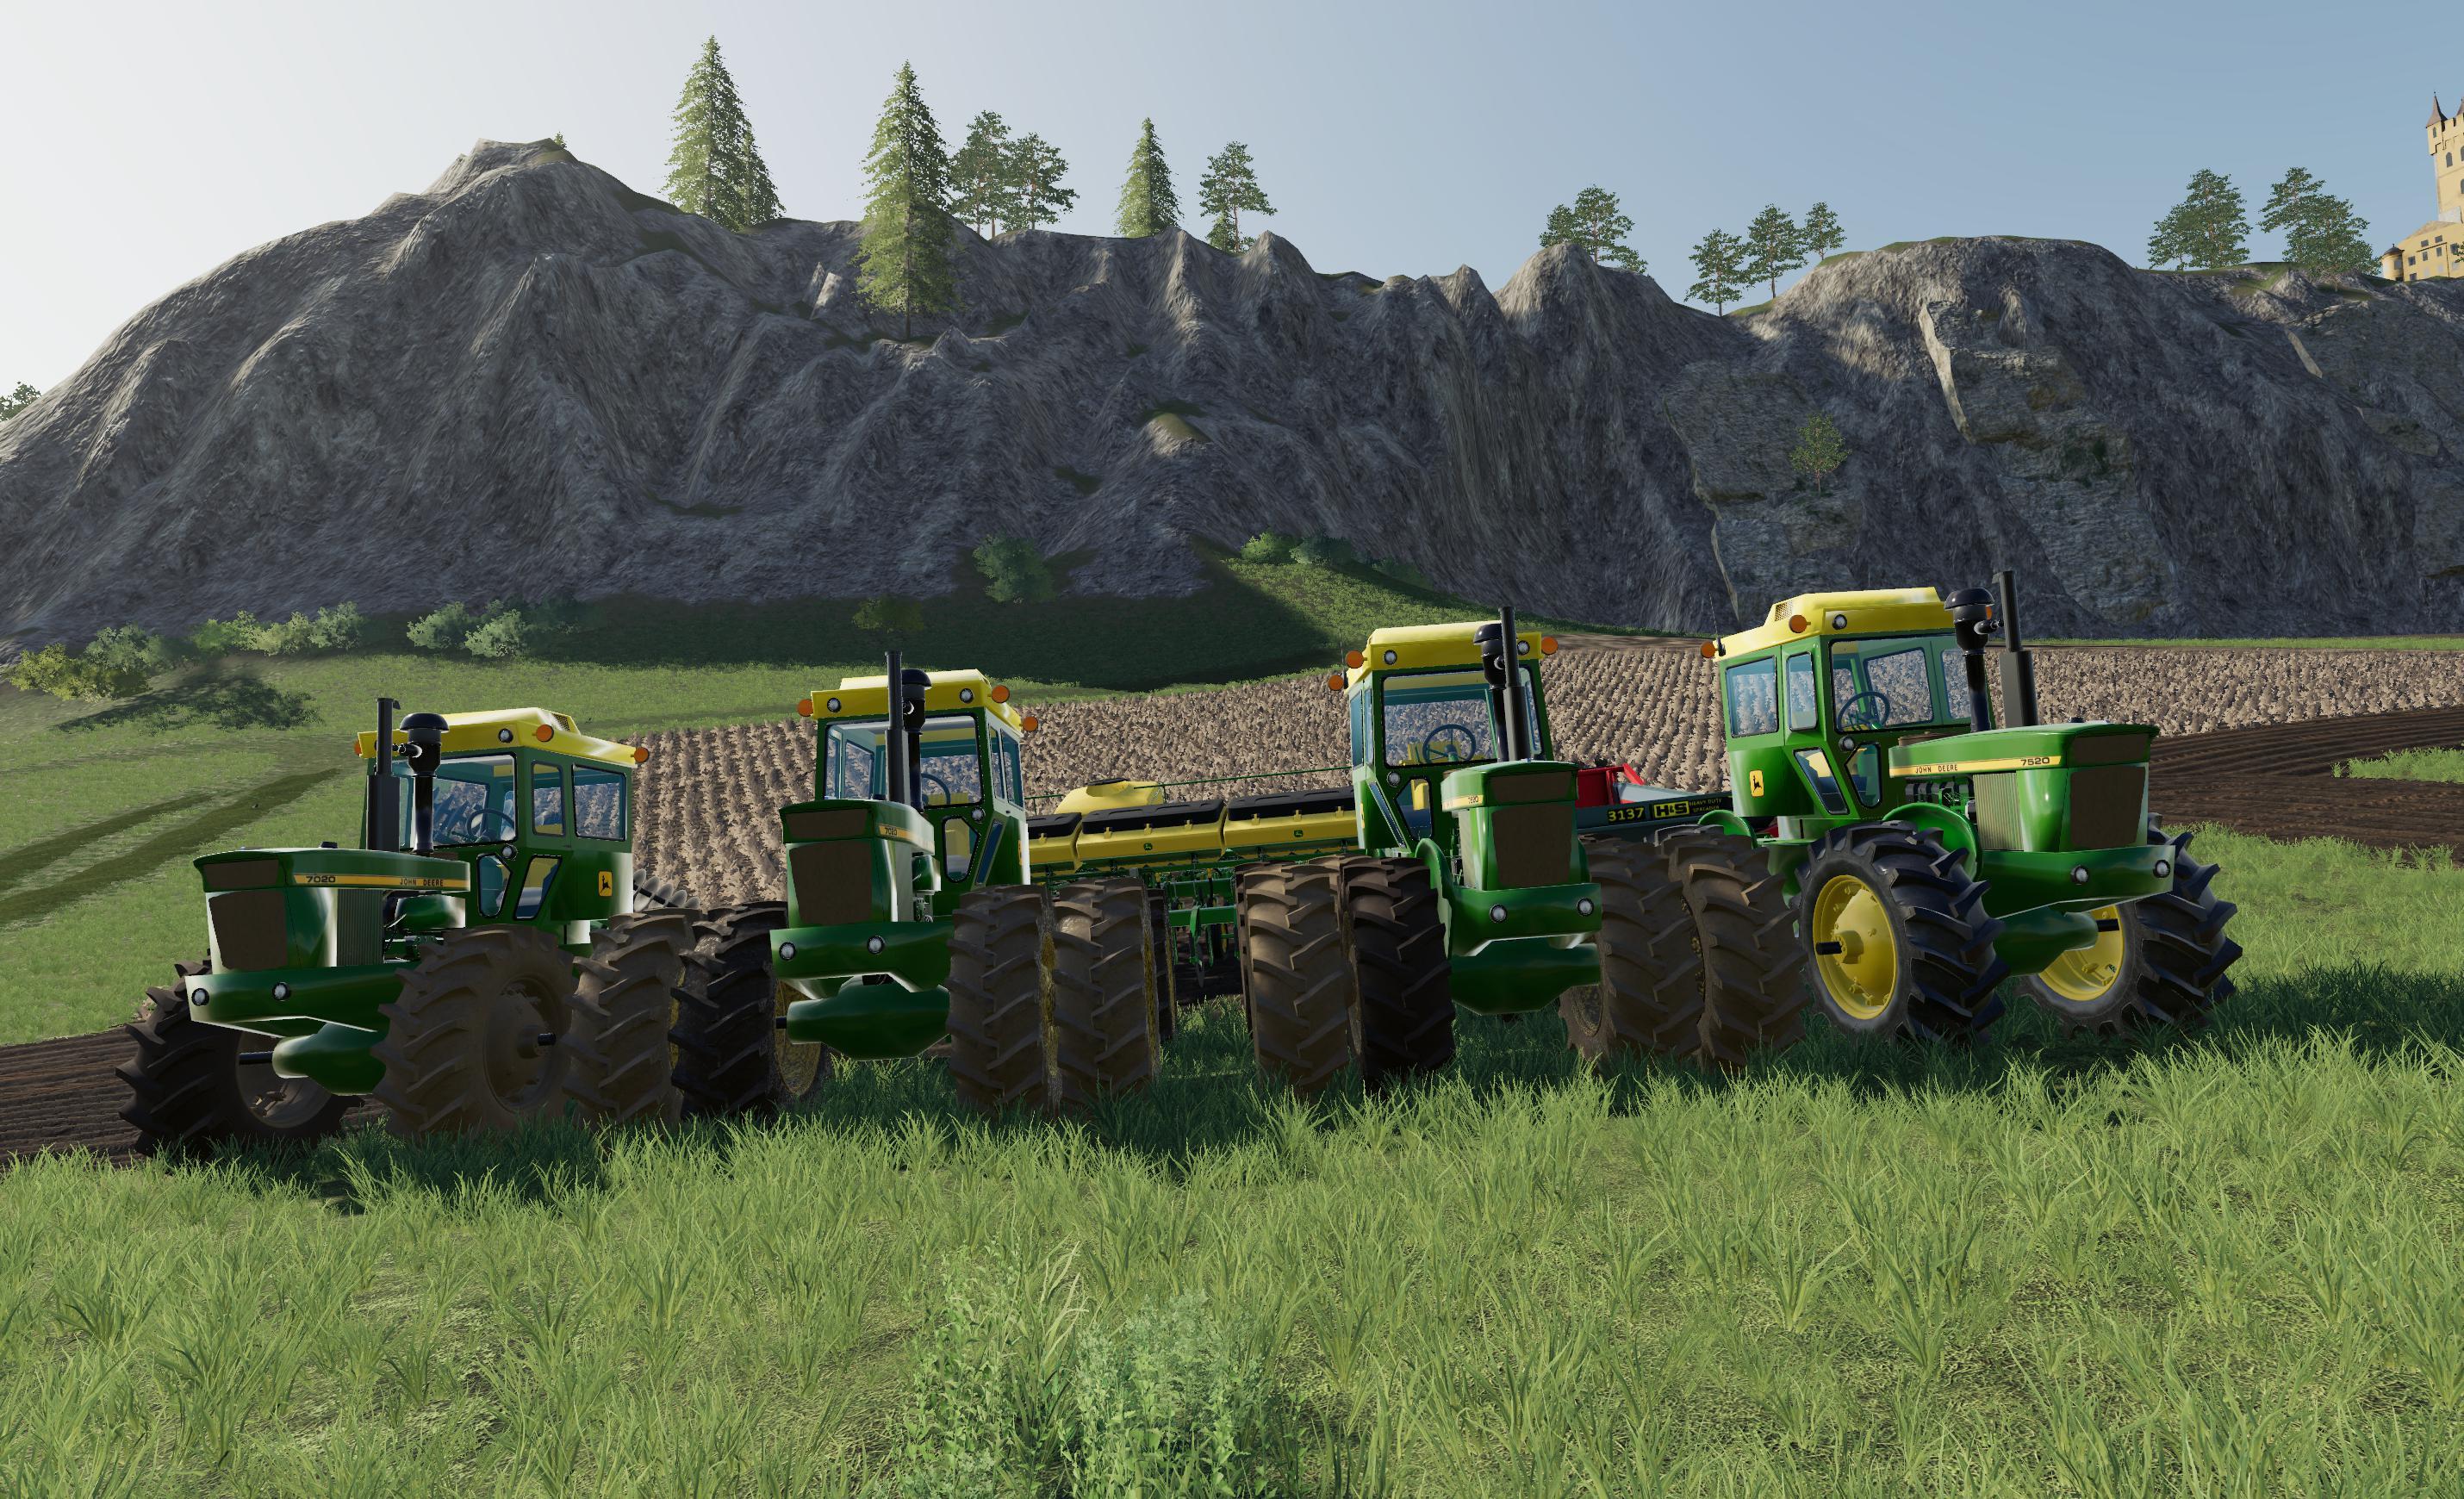 FS19 Tractors Mods - FS19 Mods - Mods club